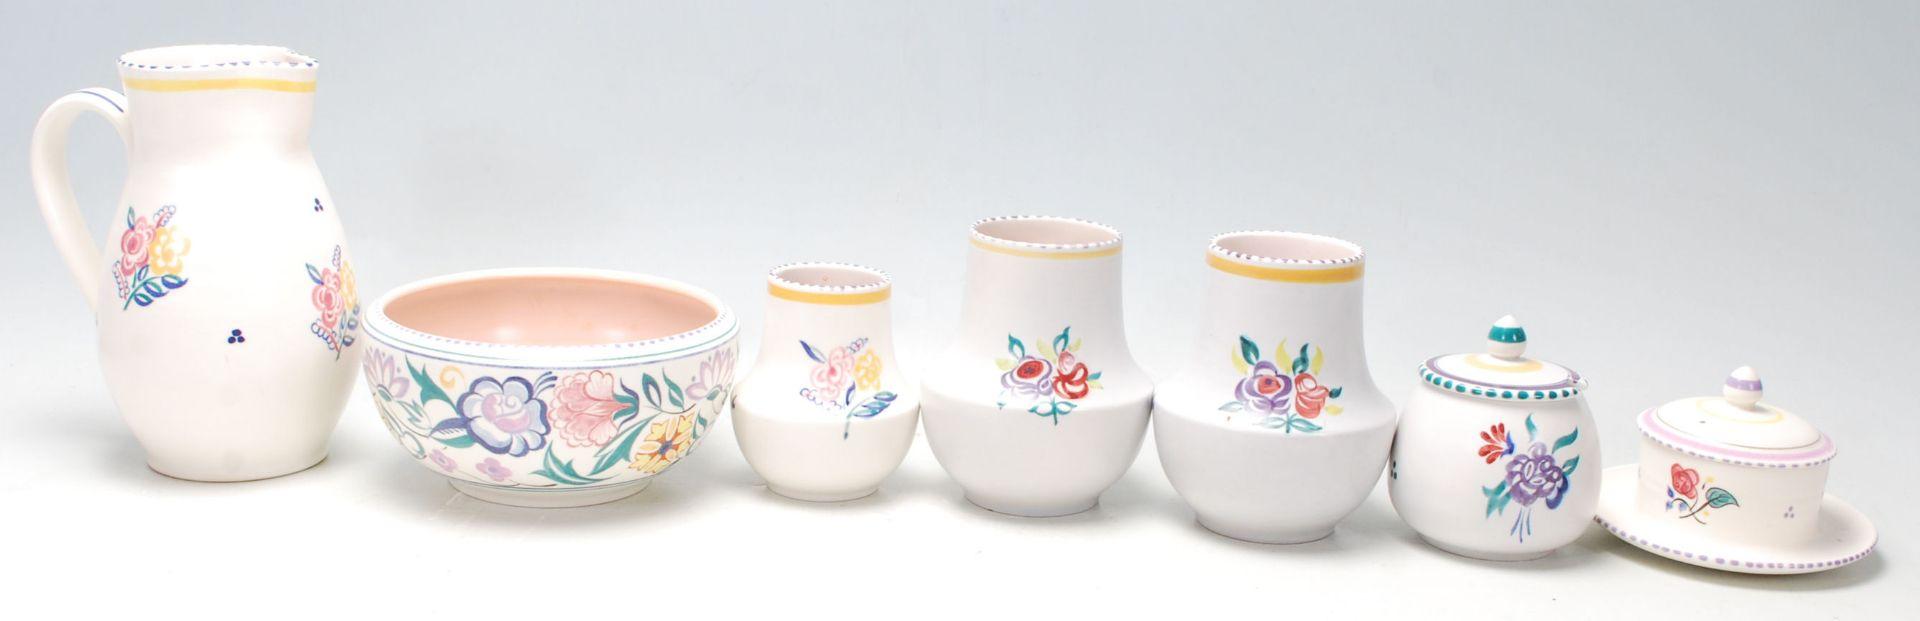 Los 22 - A group of seven vintage Poole Pottery items comprising; a jug, bowl, pair of vases, sugar bowl,